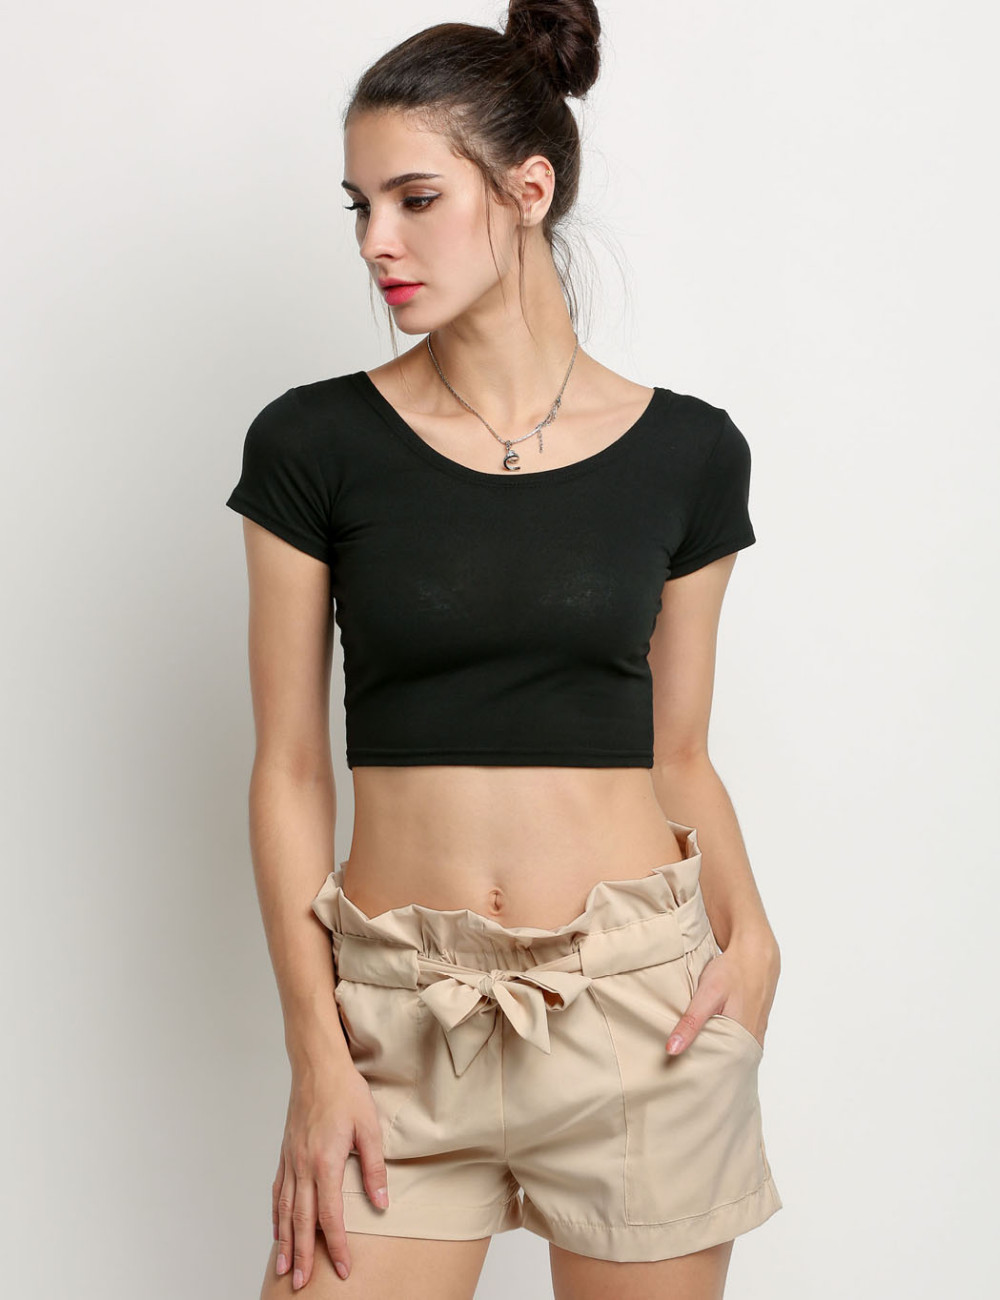 HTB1ui7gNFXXXXbaapXXq6xXFXXXj - High Waist Shorts Loose Shorts With Belt Woman PTC 59